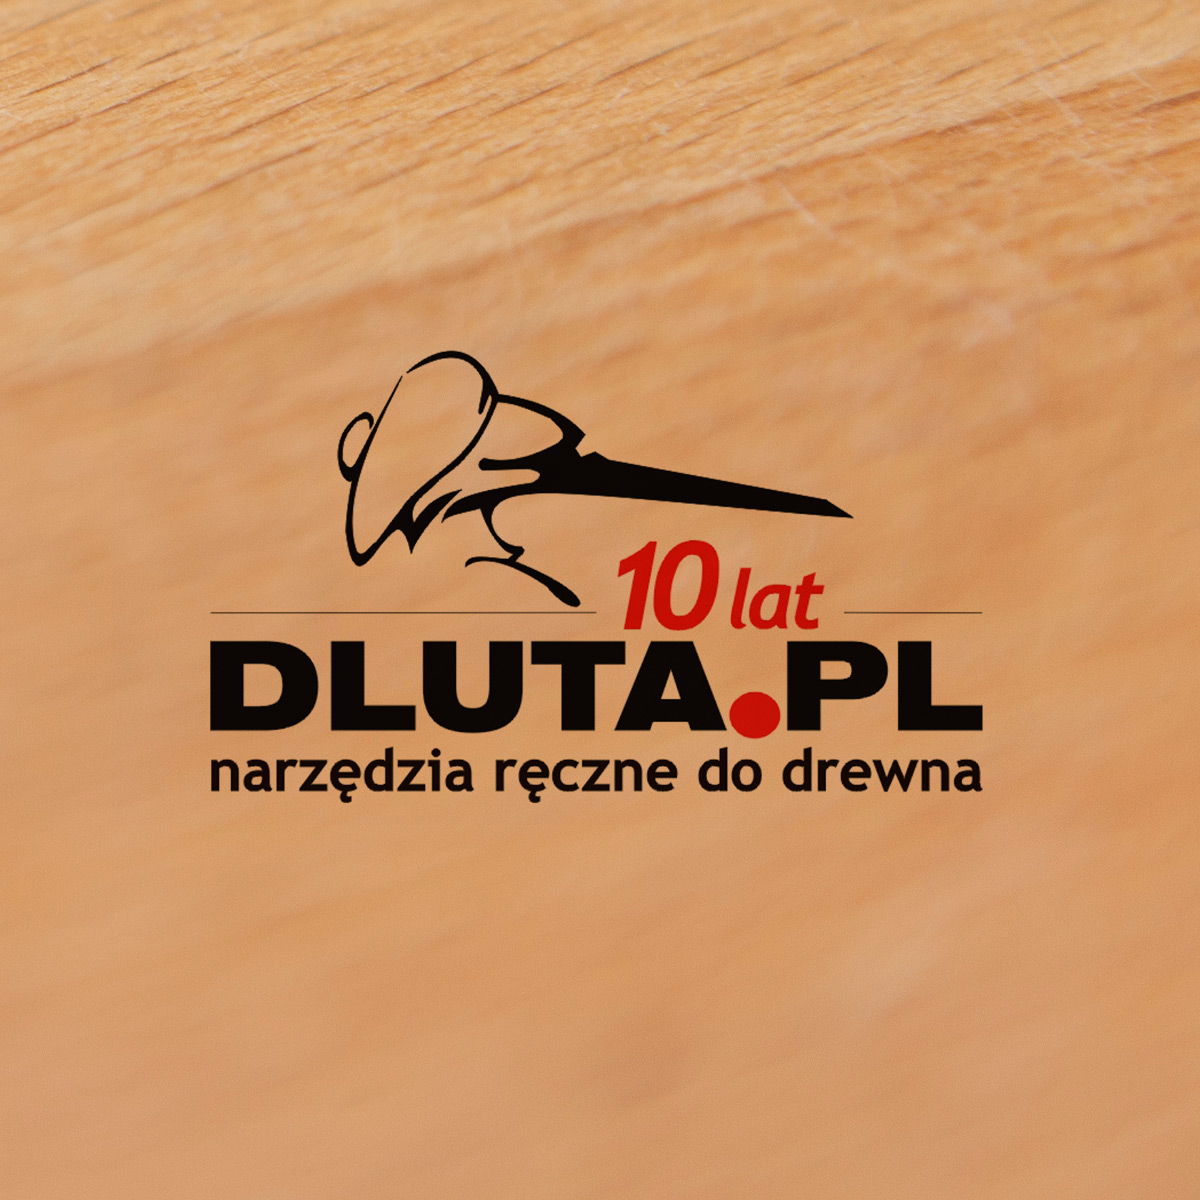 dluta_pl_4